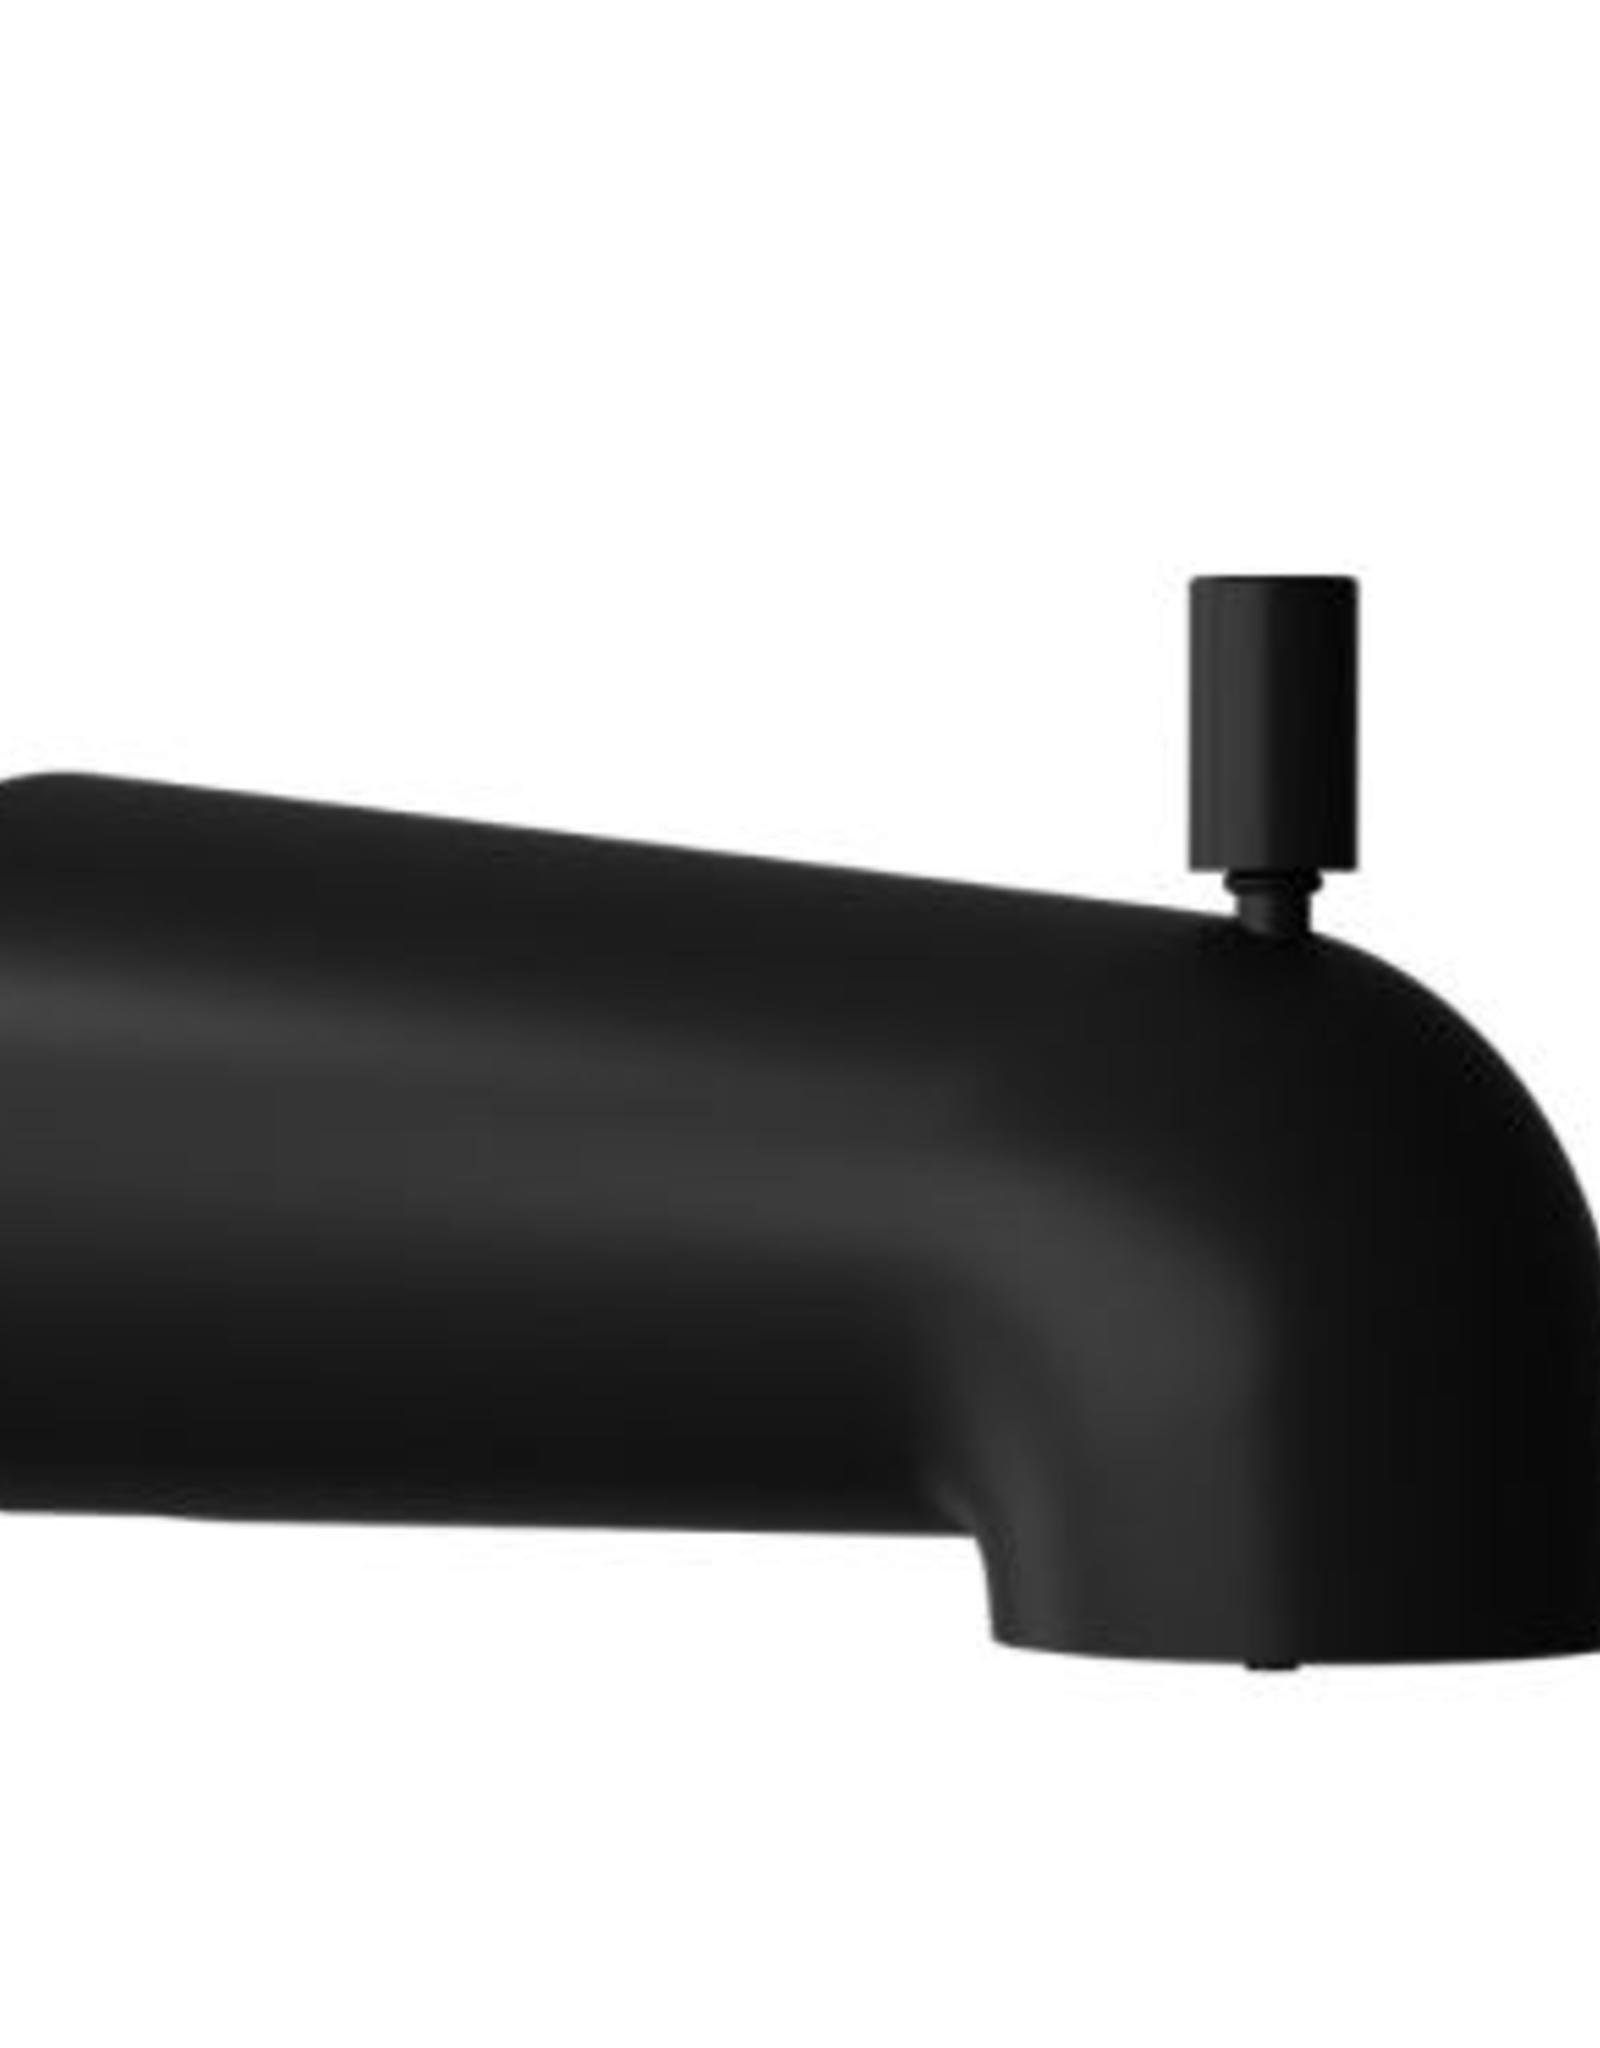 Kalia Kalia Basico PB6- Hand Shower w/ Diverter Tub Spout- Matte Black